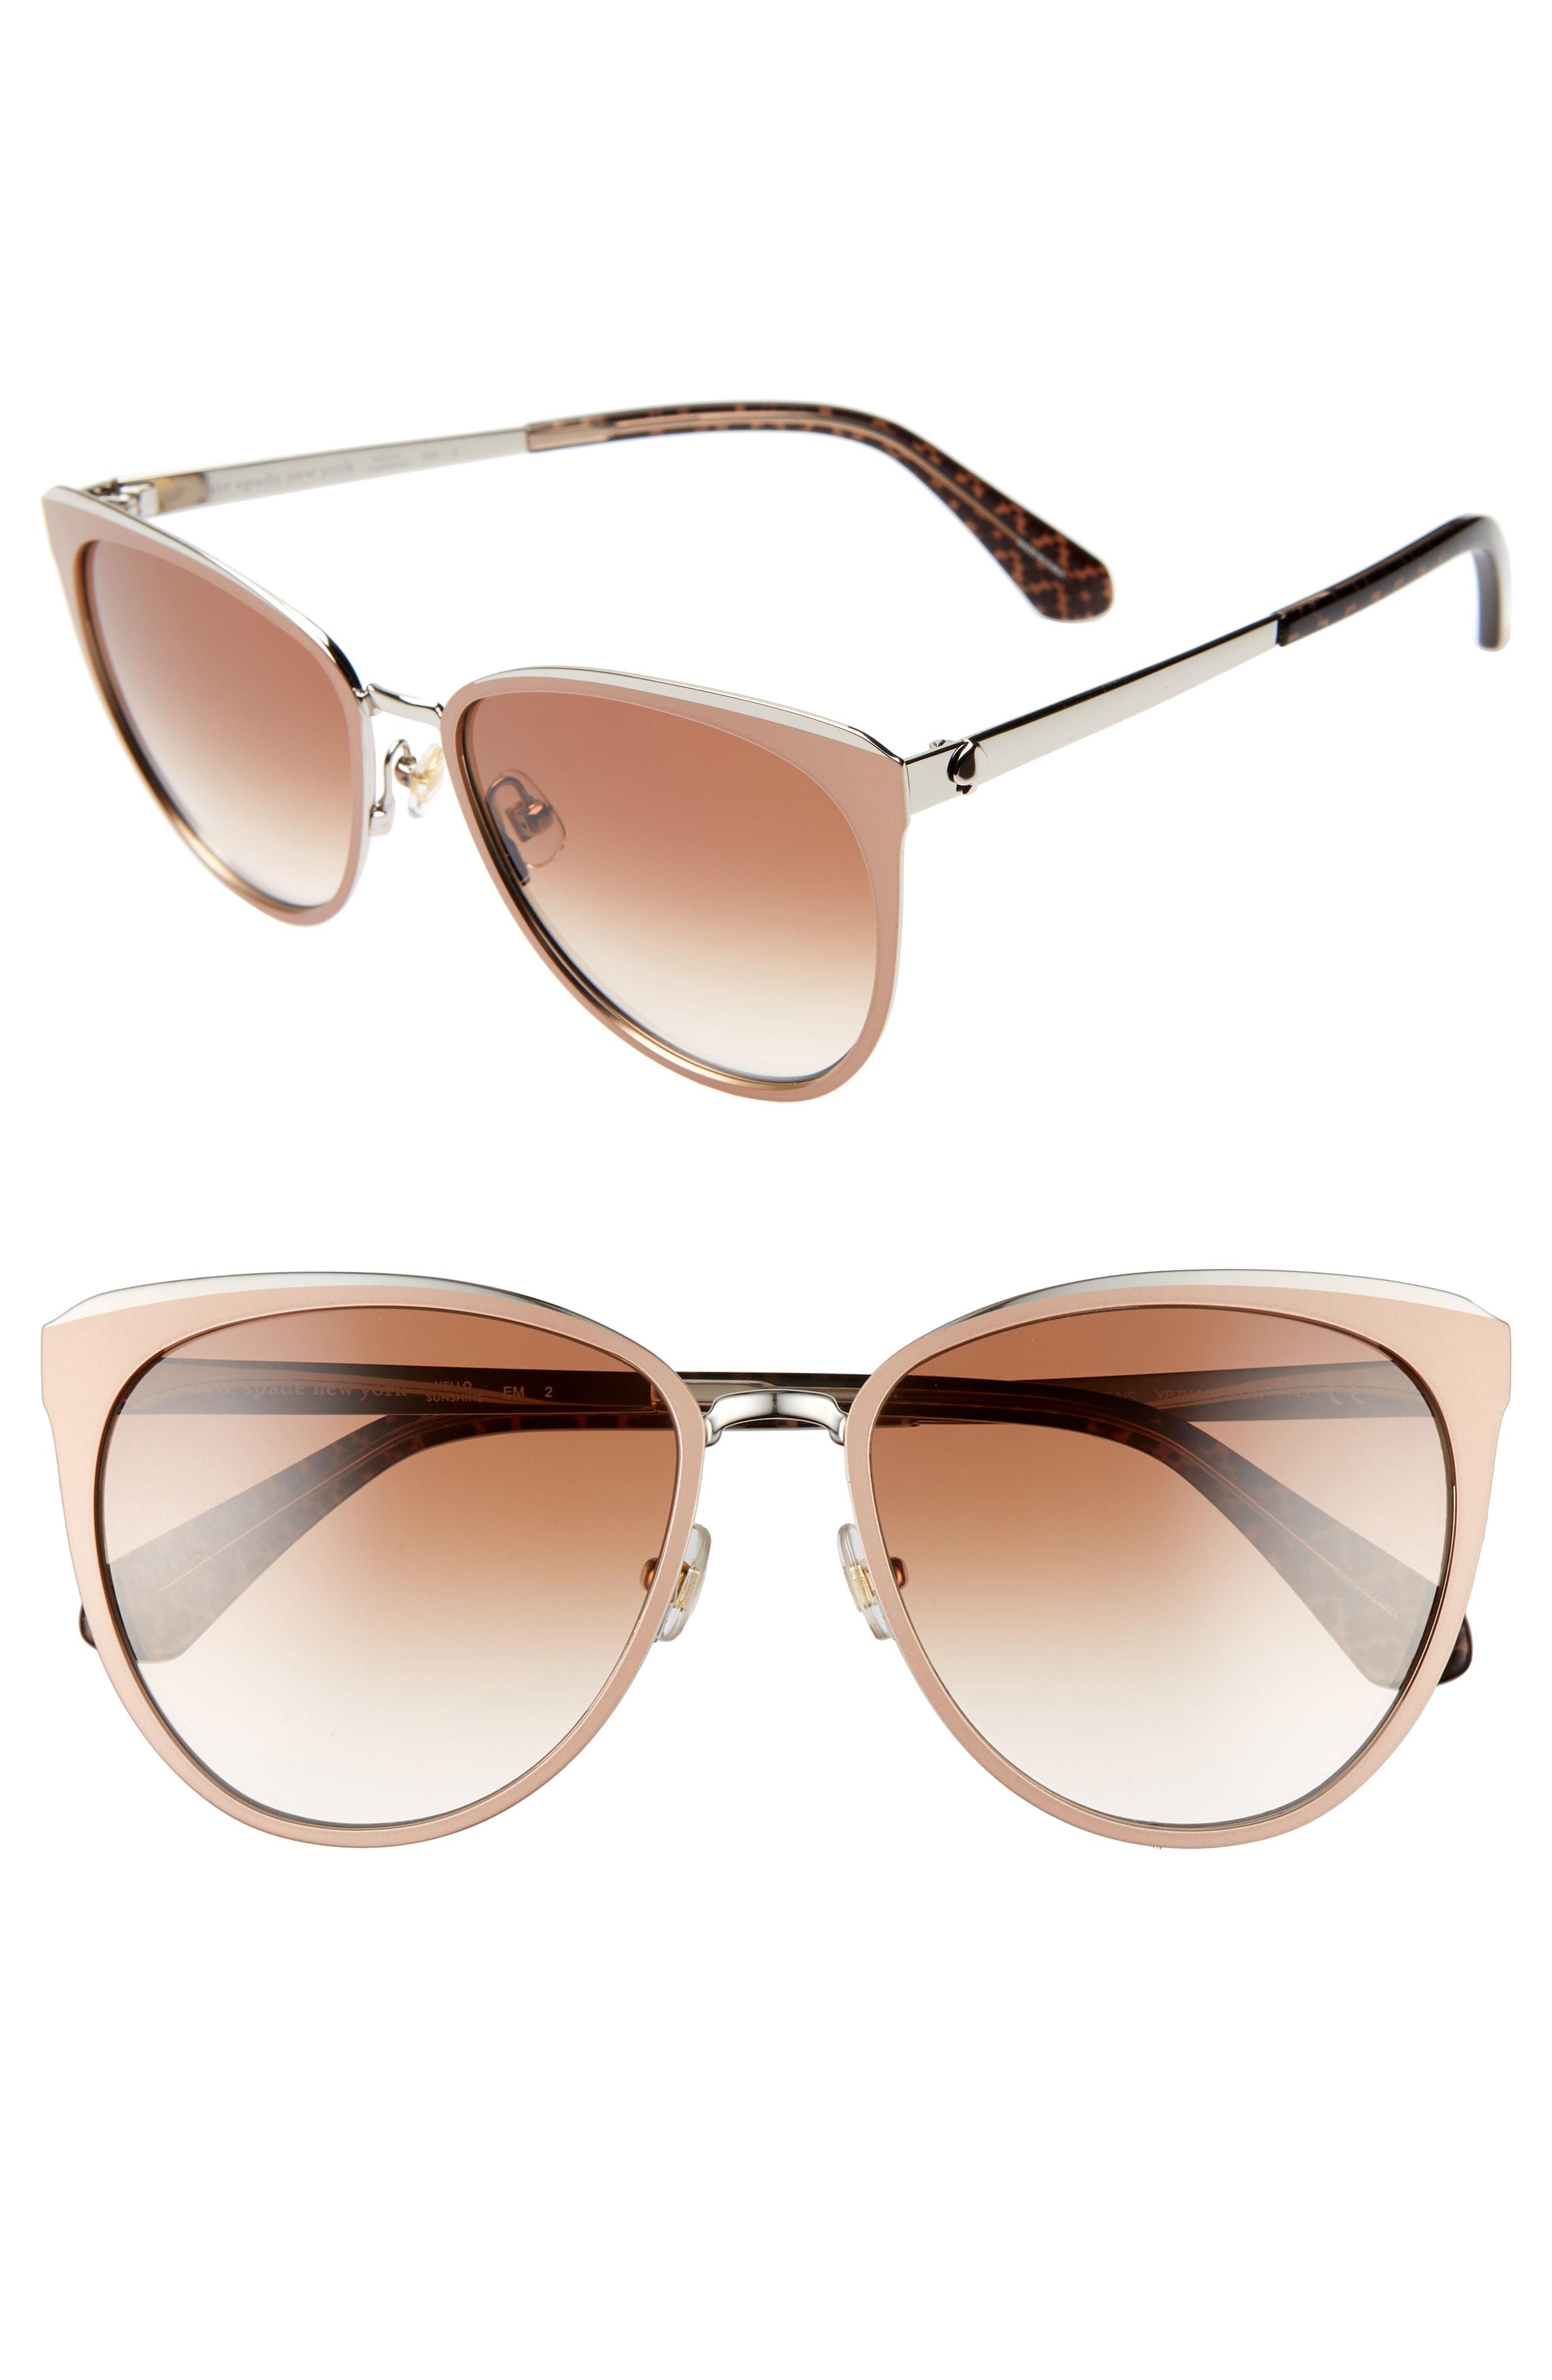 Kate Spade Jabreas 57mm Cat Eye Sunglasses In Neutrals